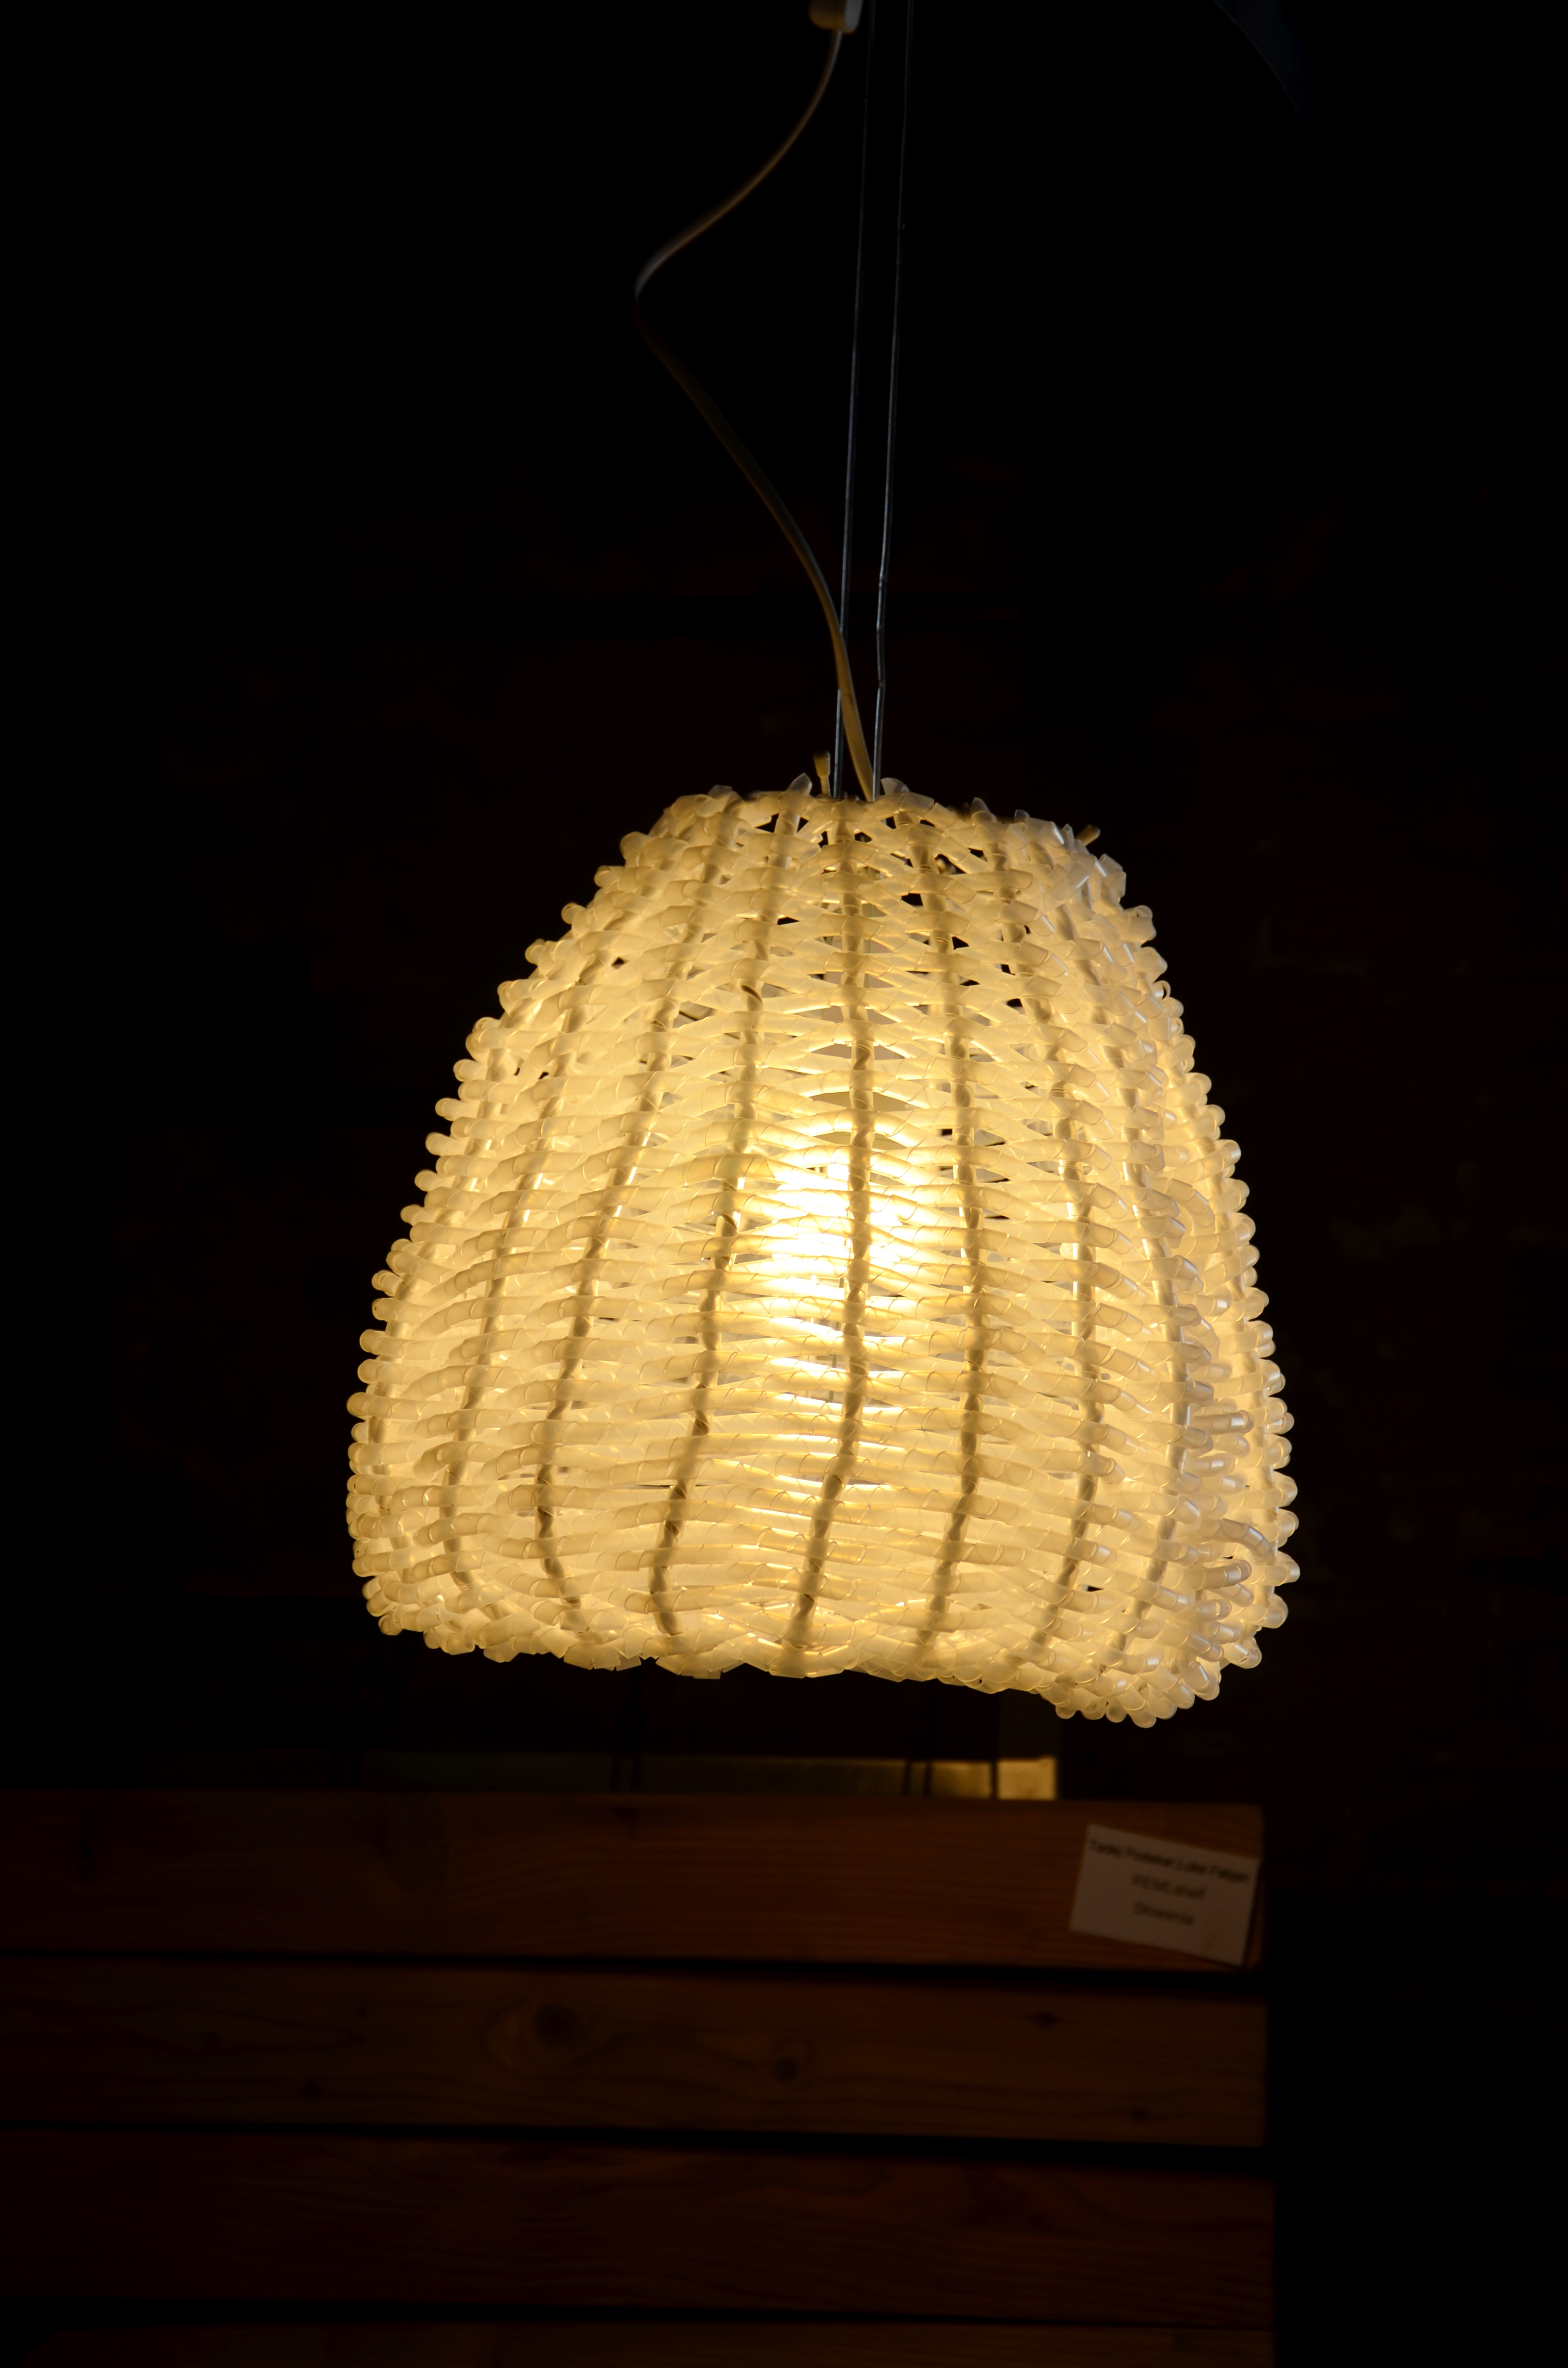 Plastique royale lamp, Tamina Ioana Puica (fot. M. Armata)